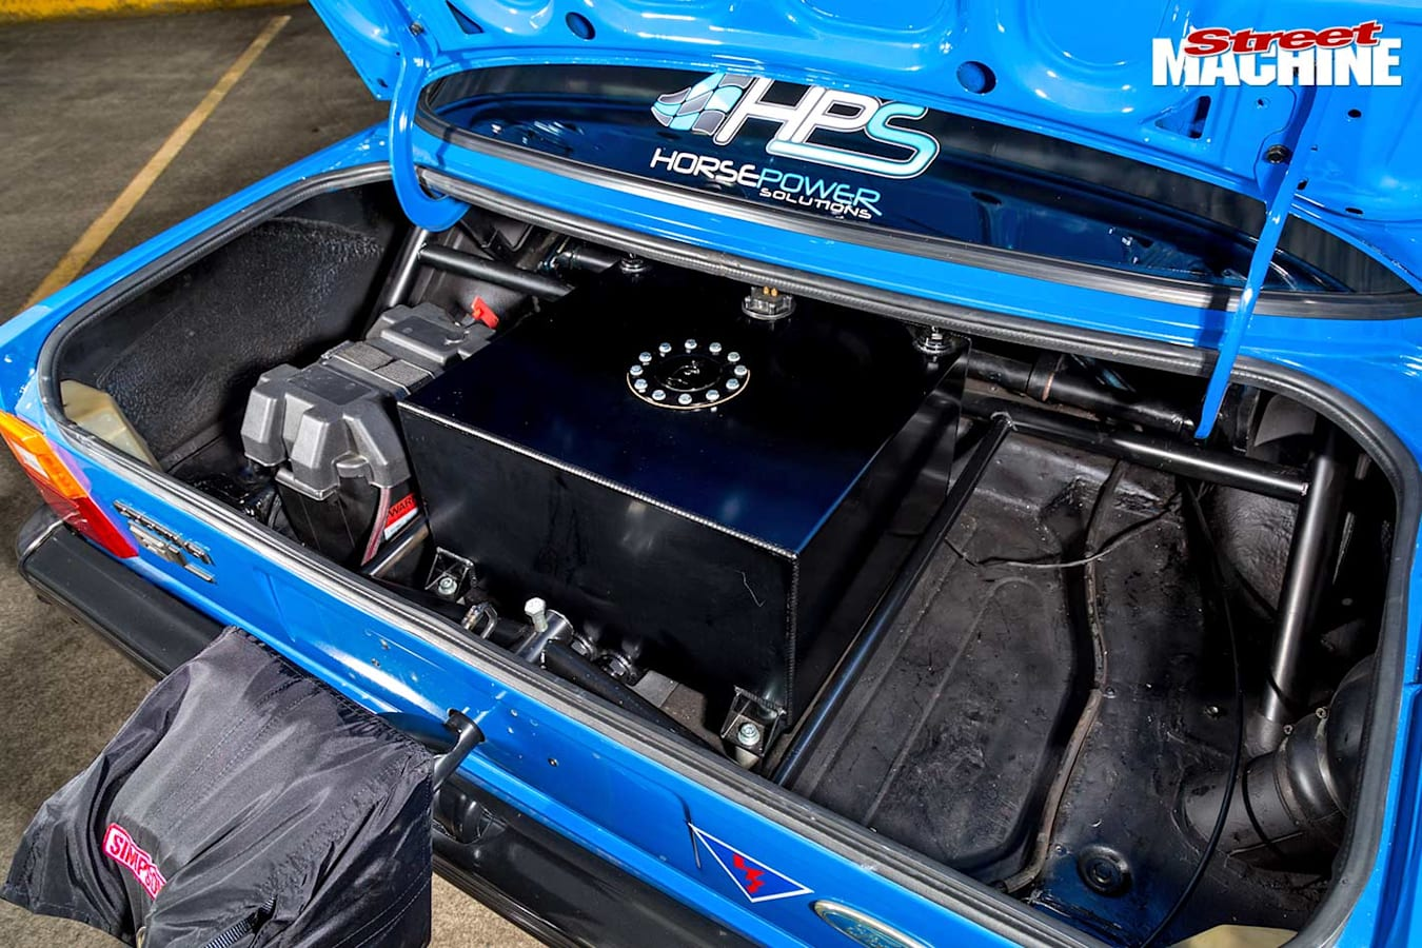 Ford Cortina boot